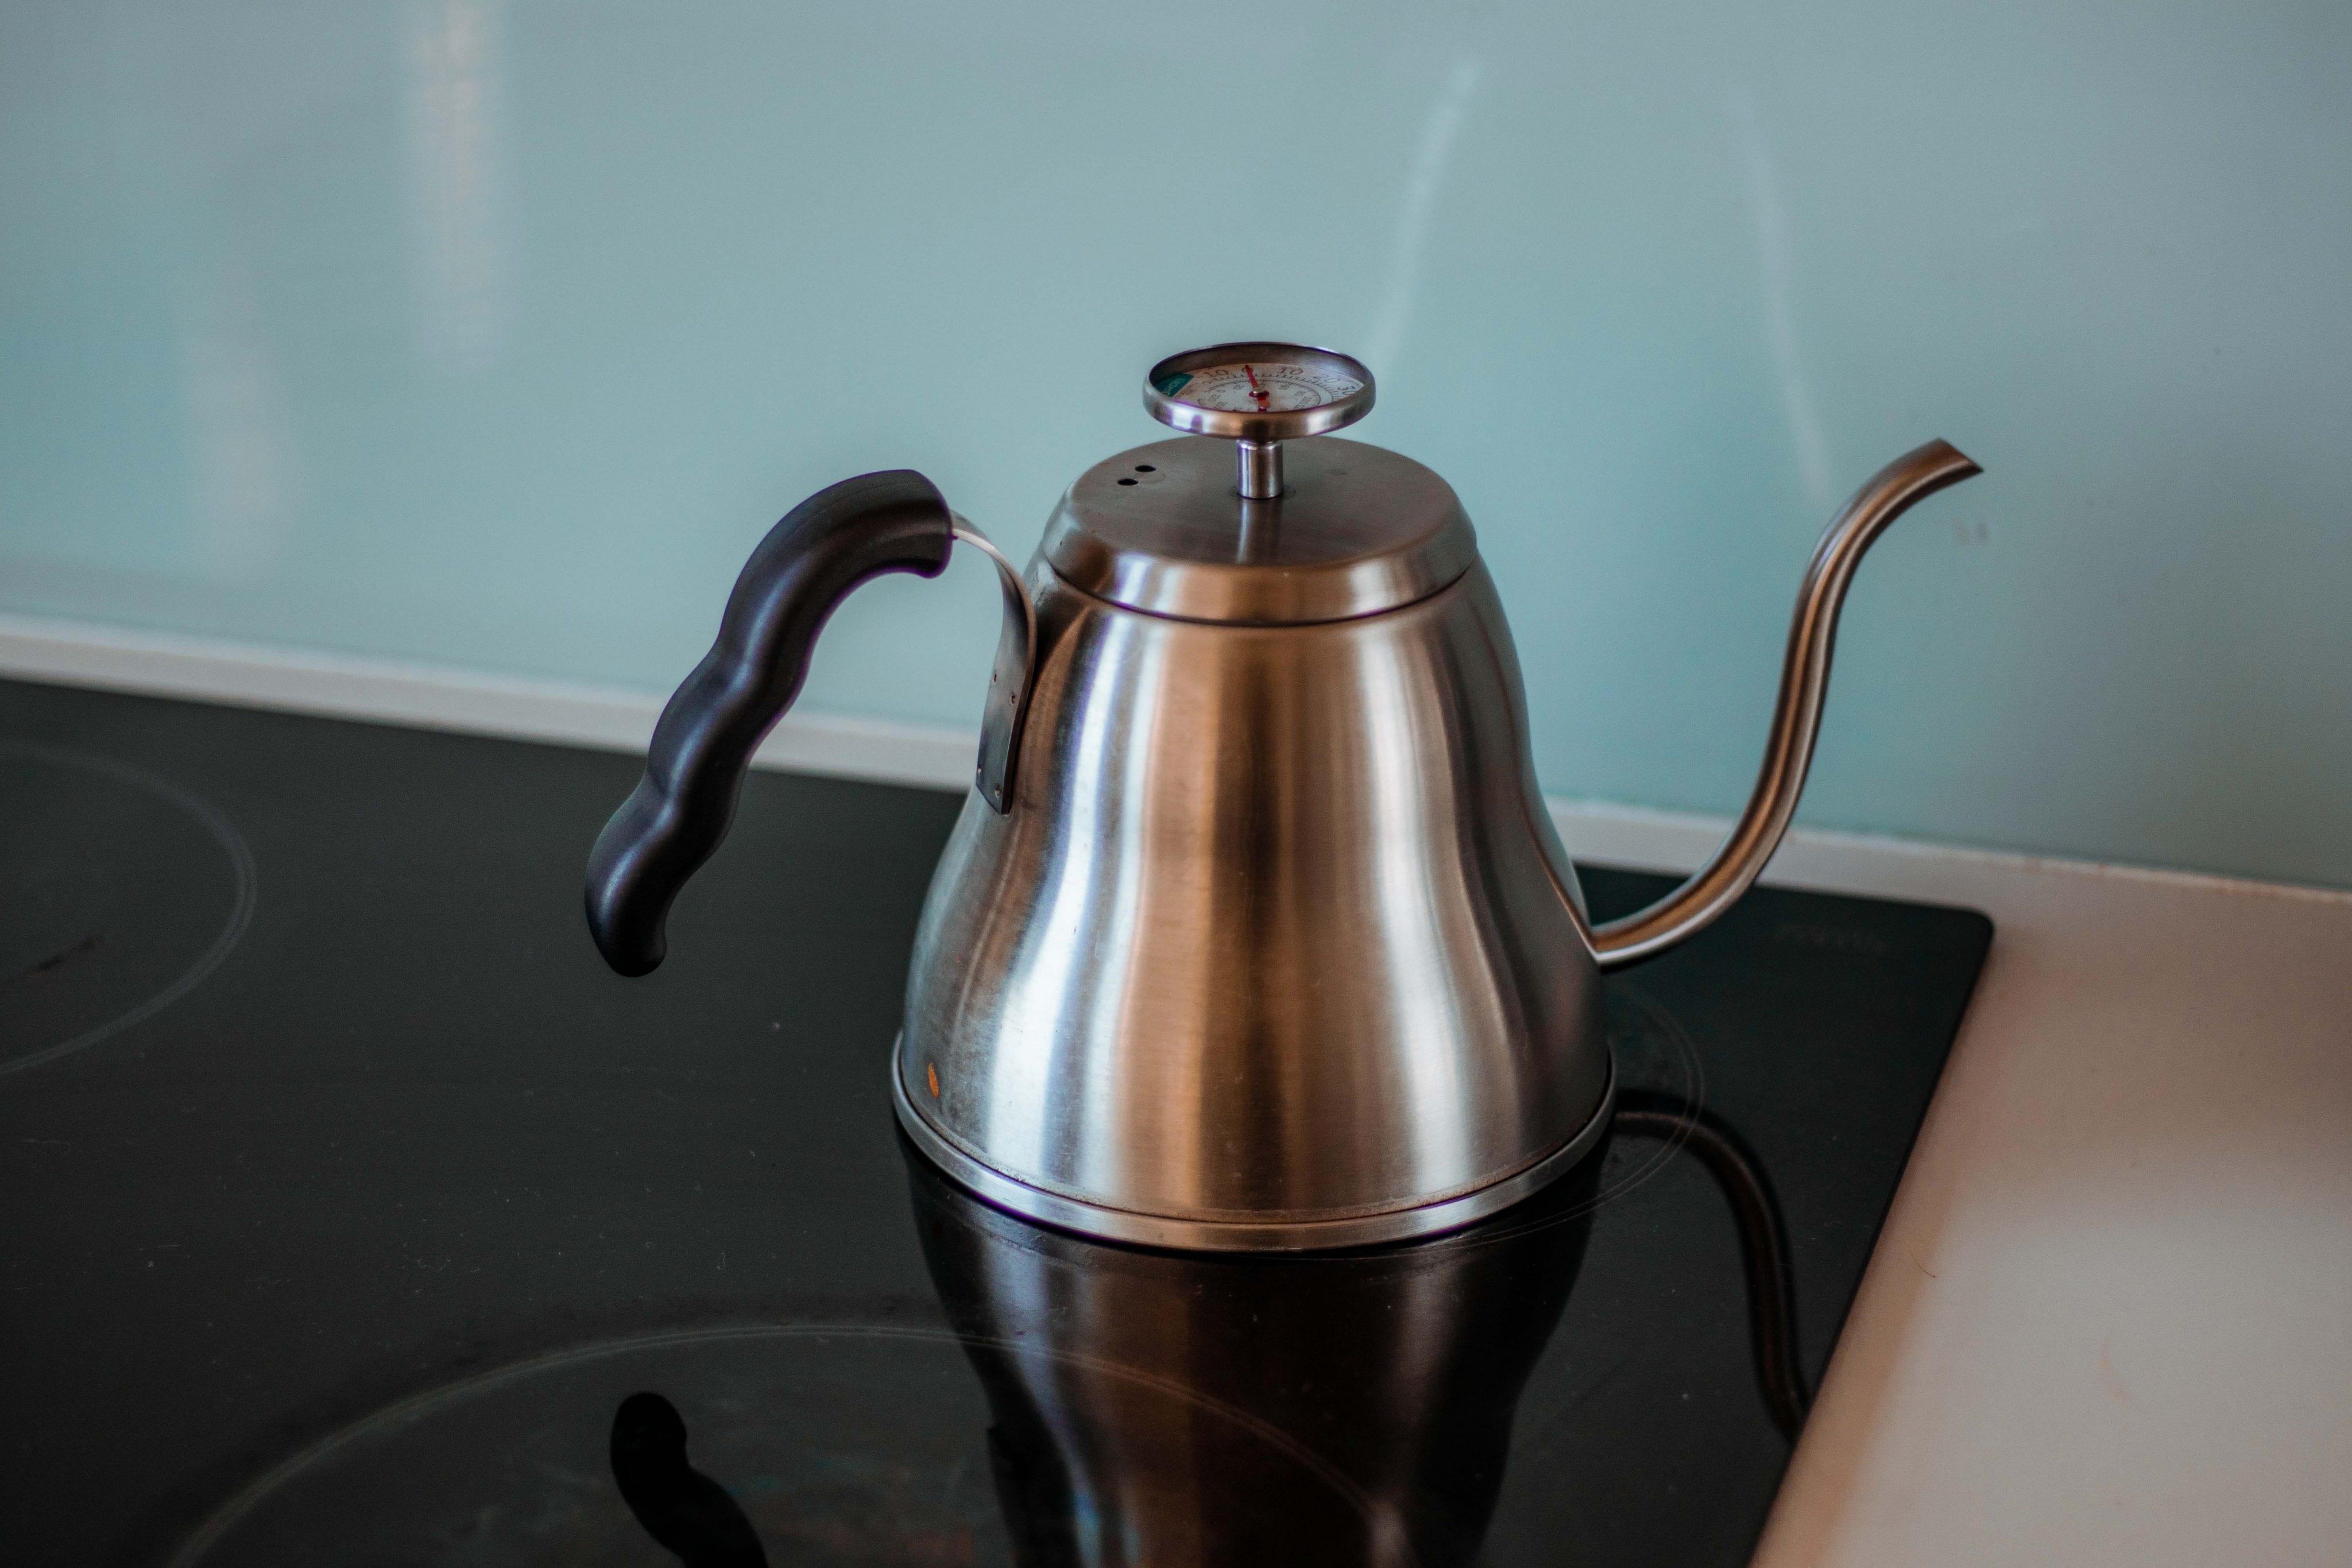 stainless steel goose neck tea kettle